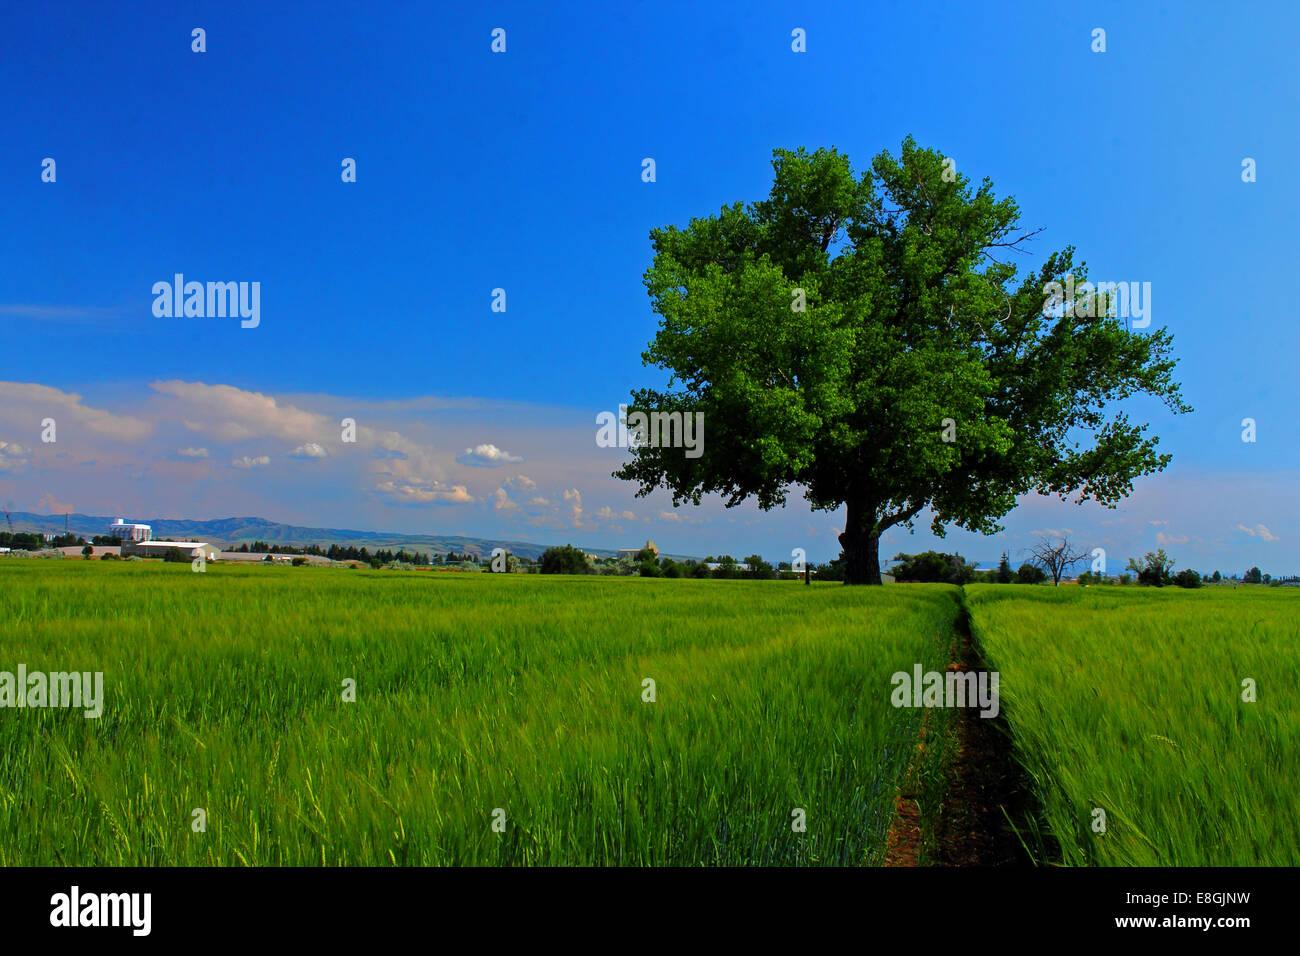 USA, Idaho, Bonneville County, Idaho Falls, Baum im Acker am Sommertag Stockbild